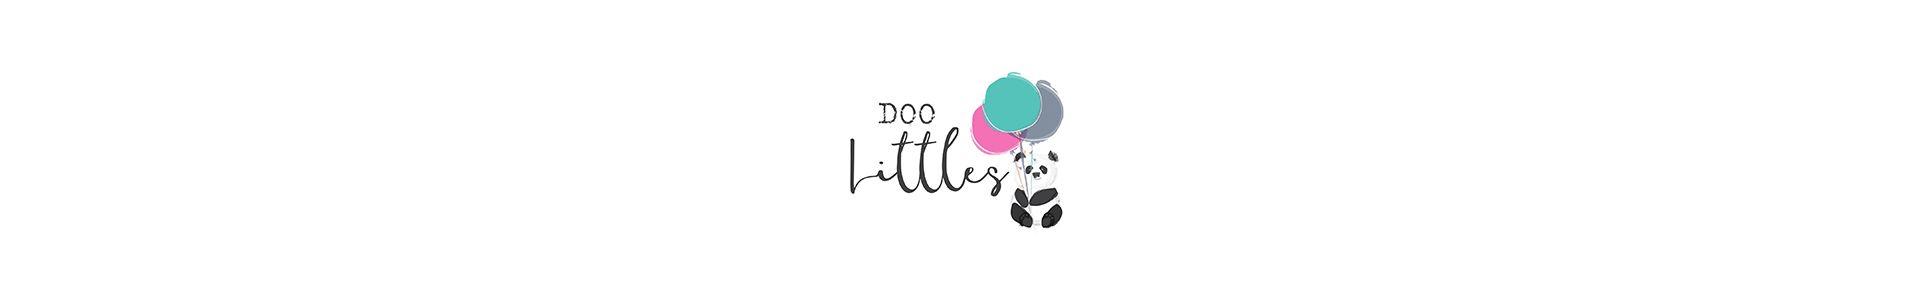 Doo Littles